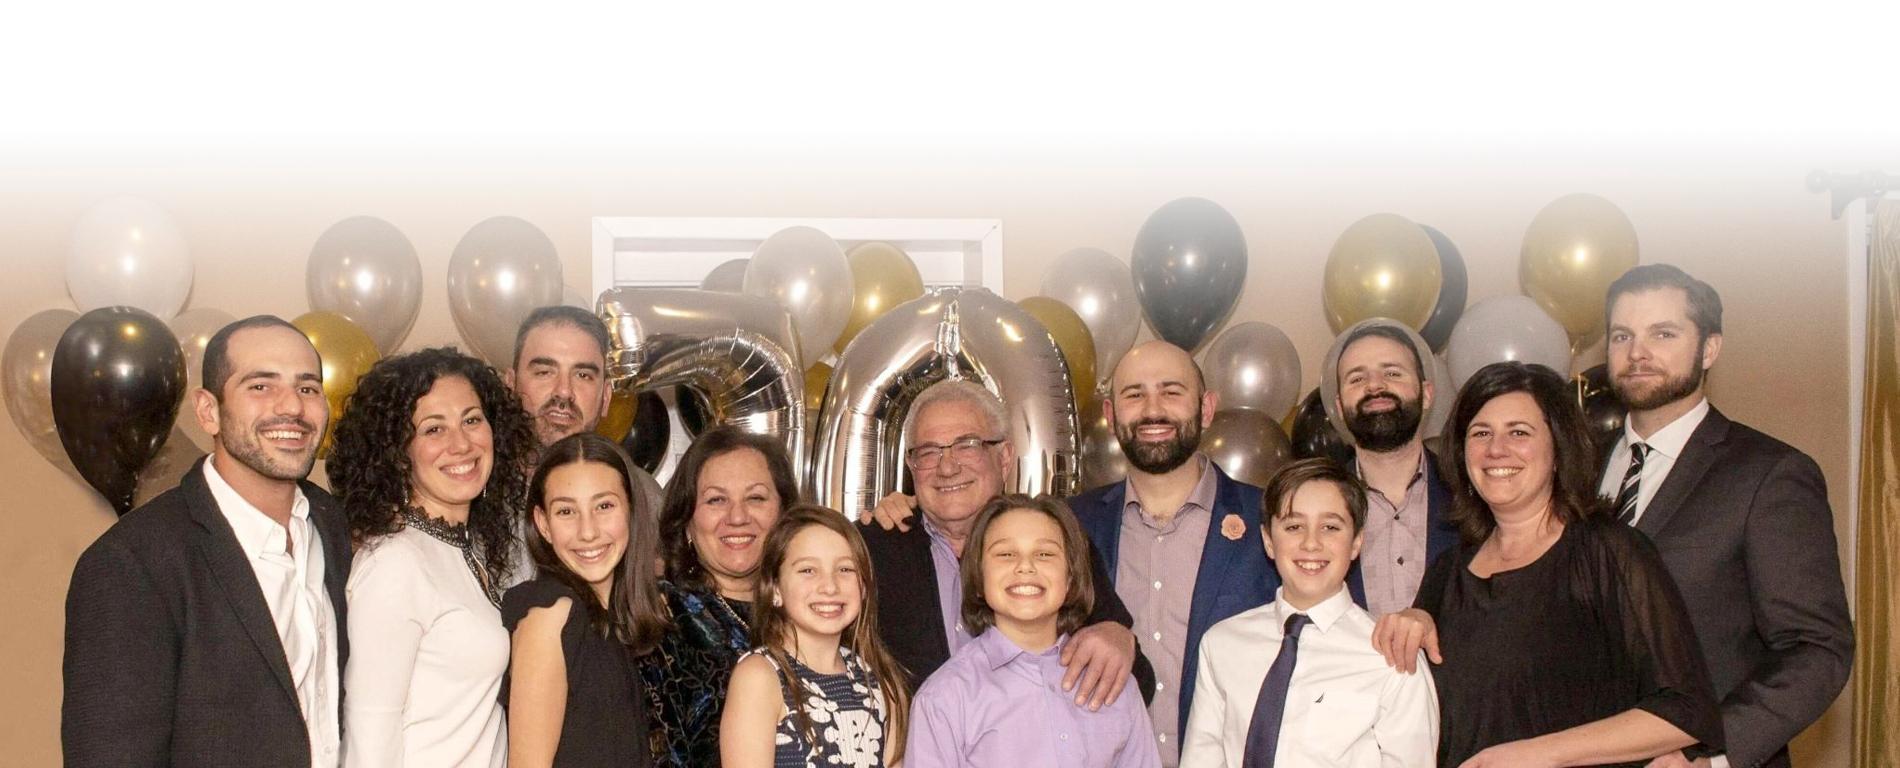 La Rose Family Photo